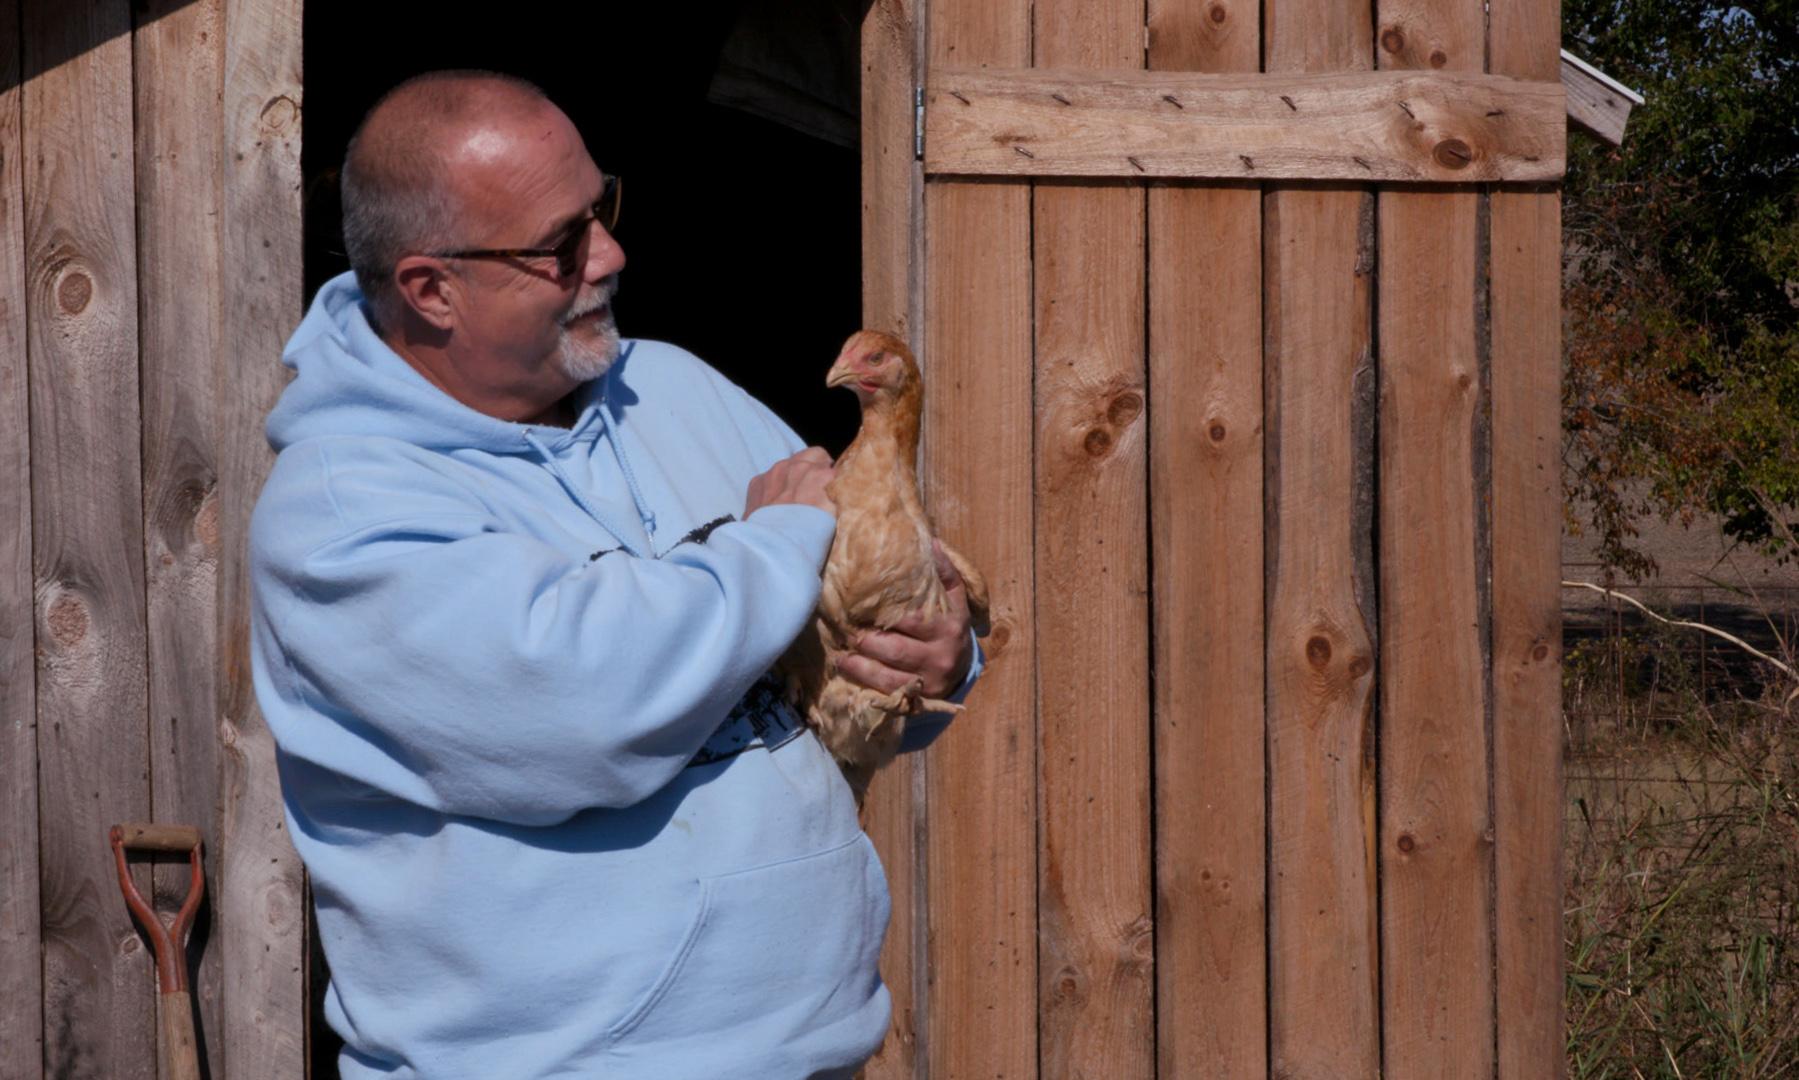 Orleans farmer Pat Hall